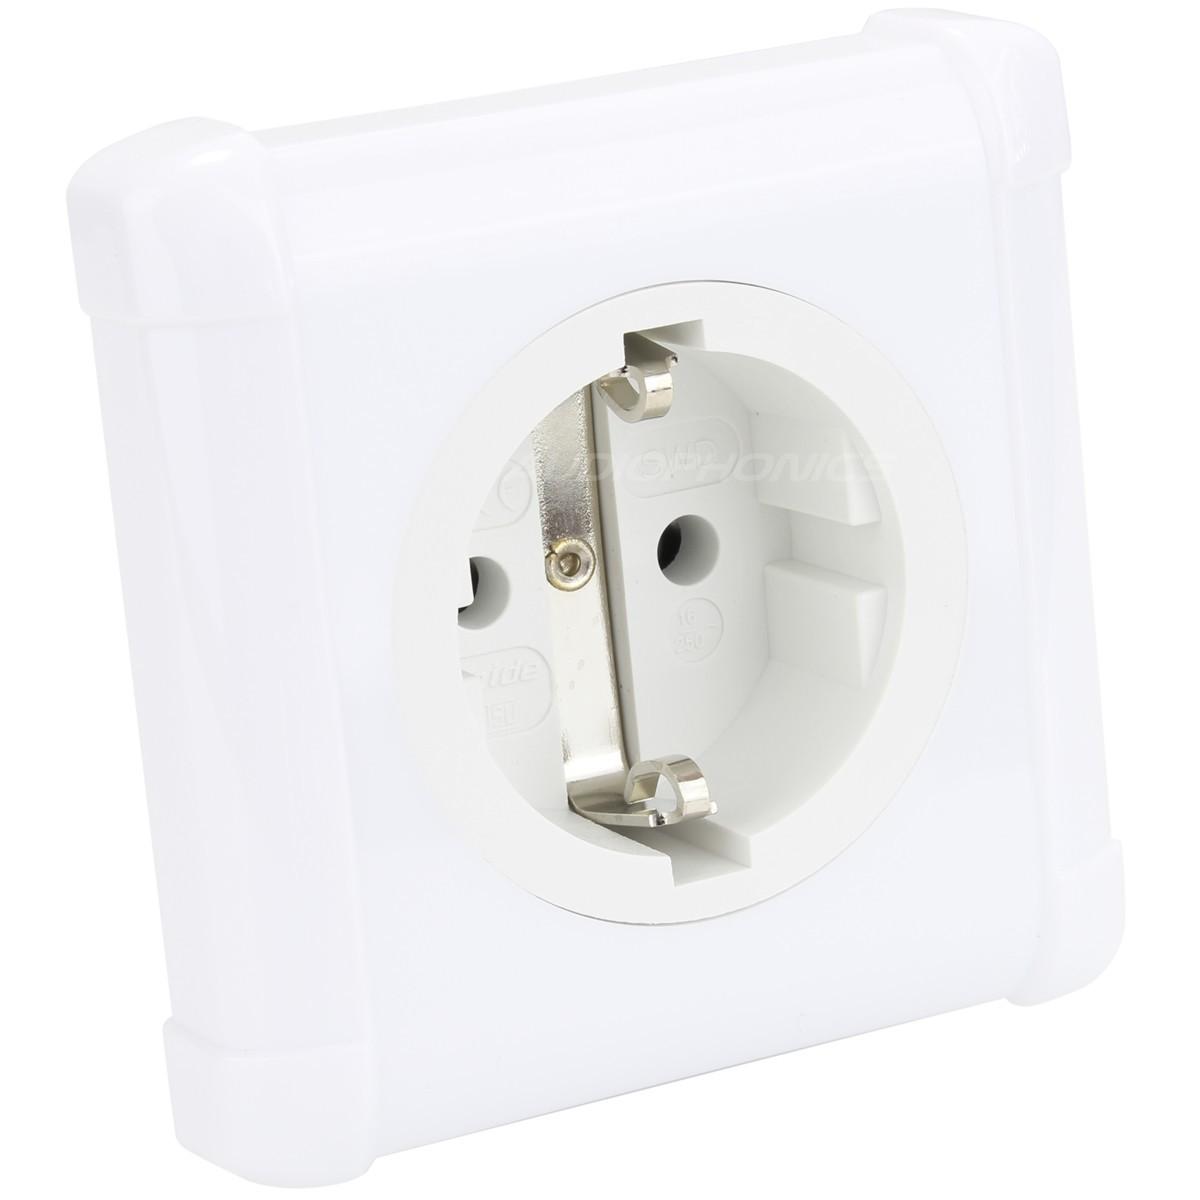 OYAIDE SWD-XXX-e SCHUKO Wall Plug Gold Plated / Palladium